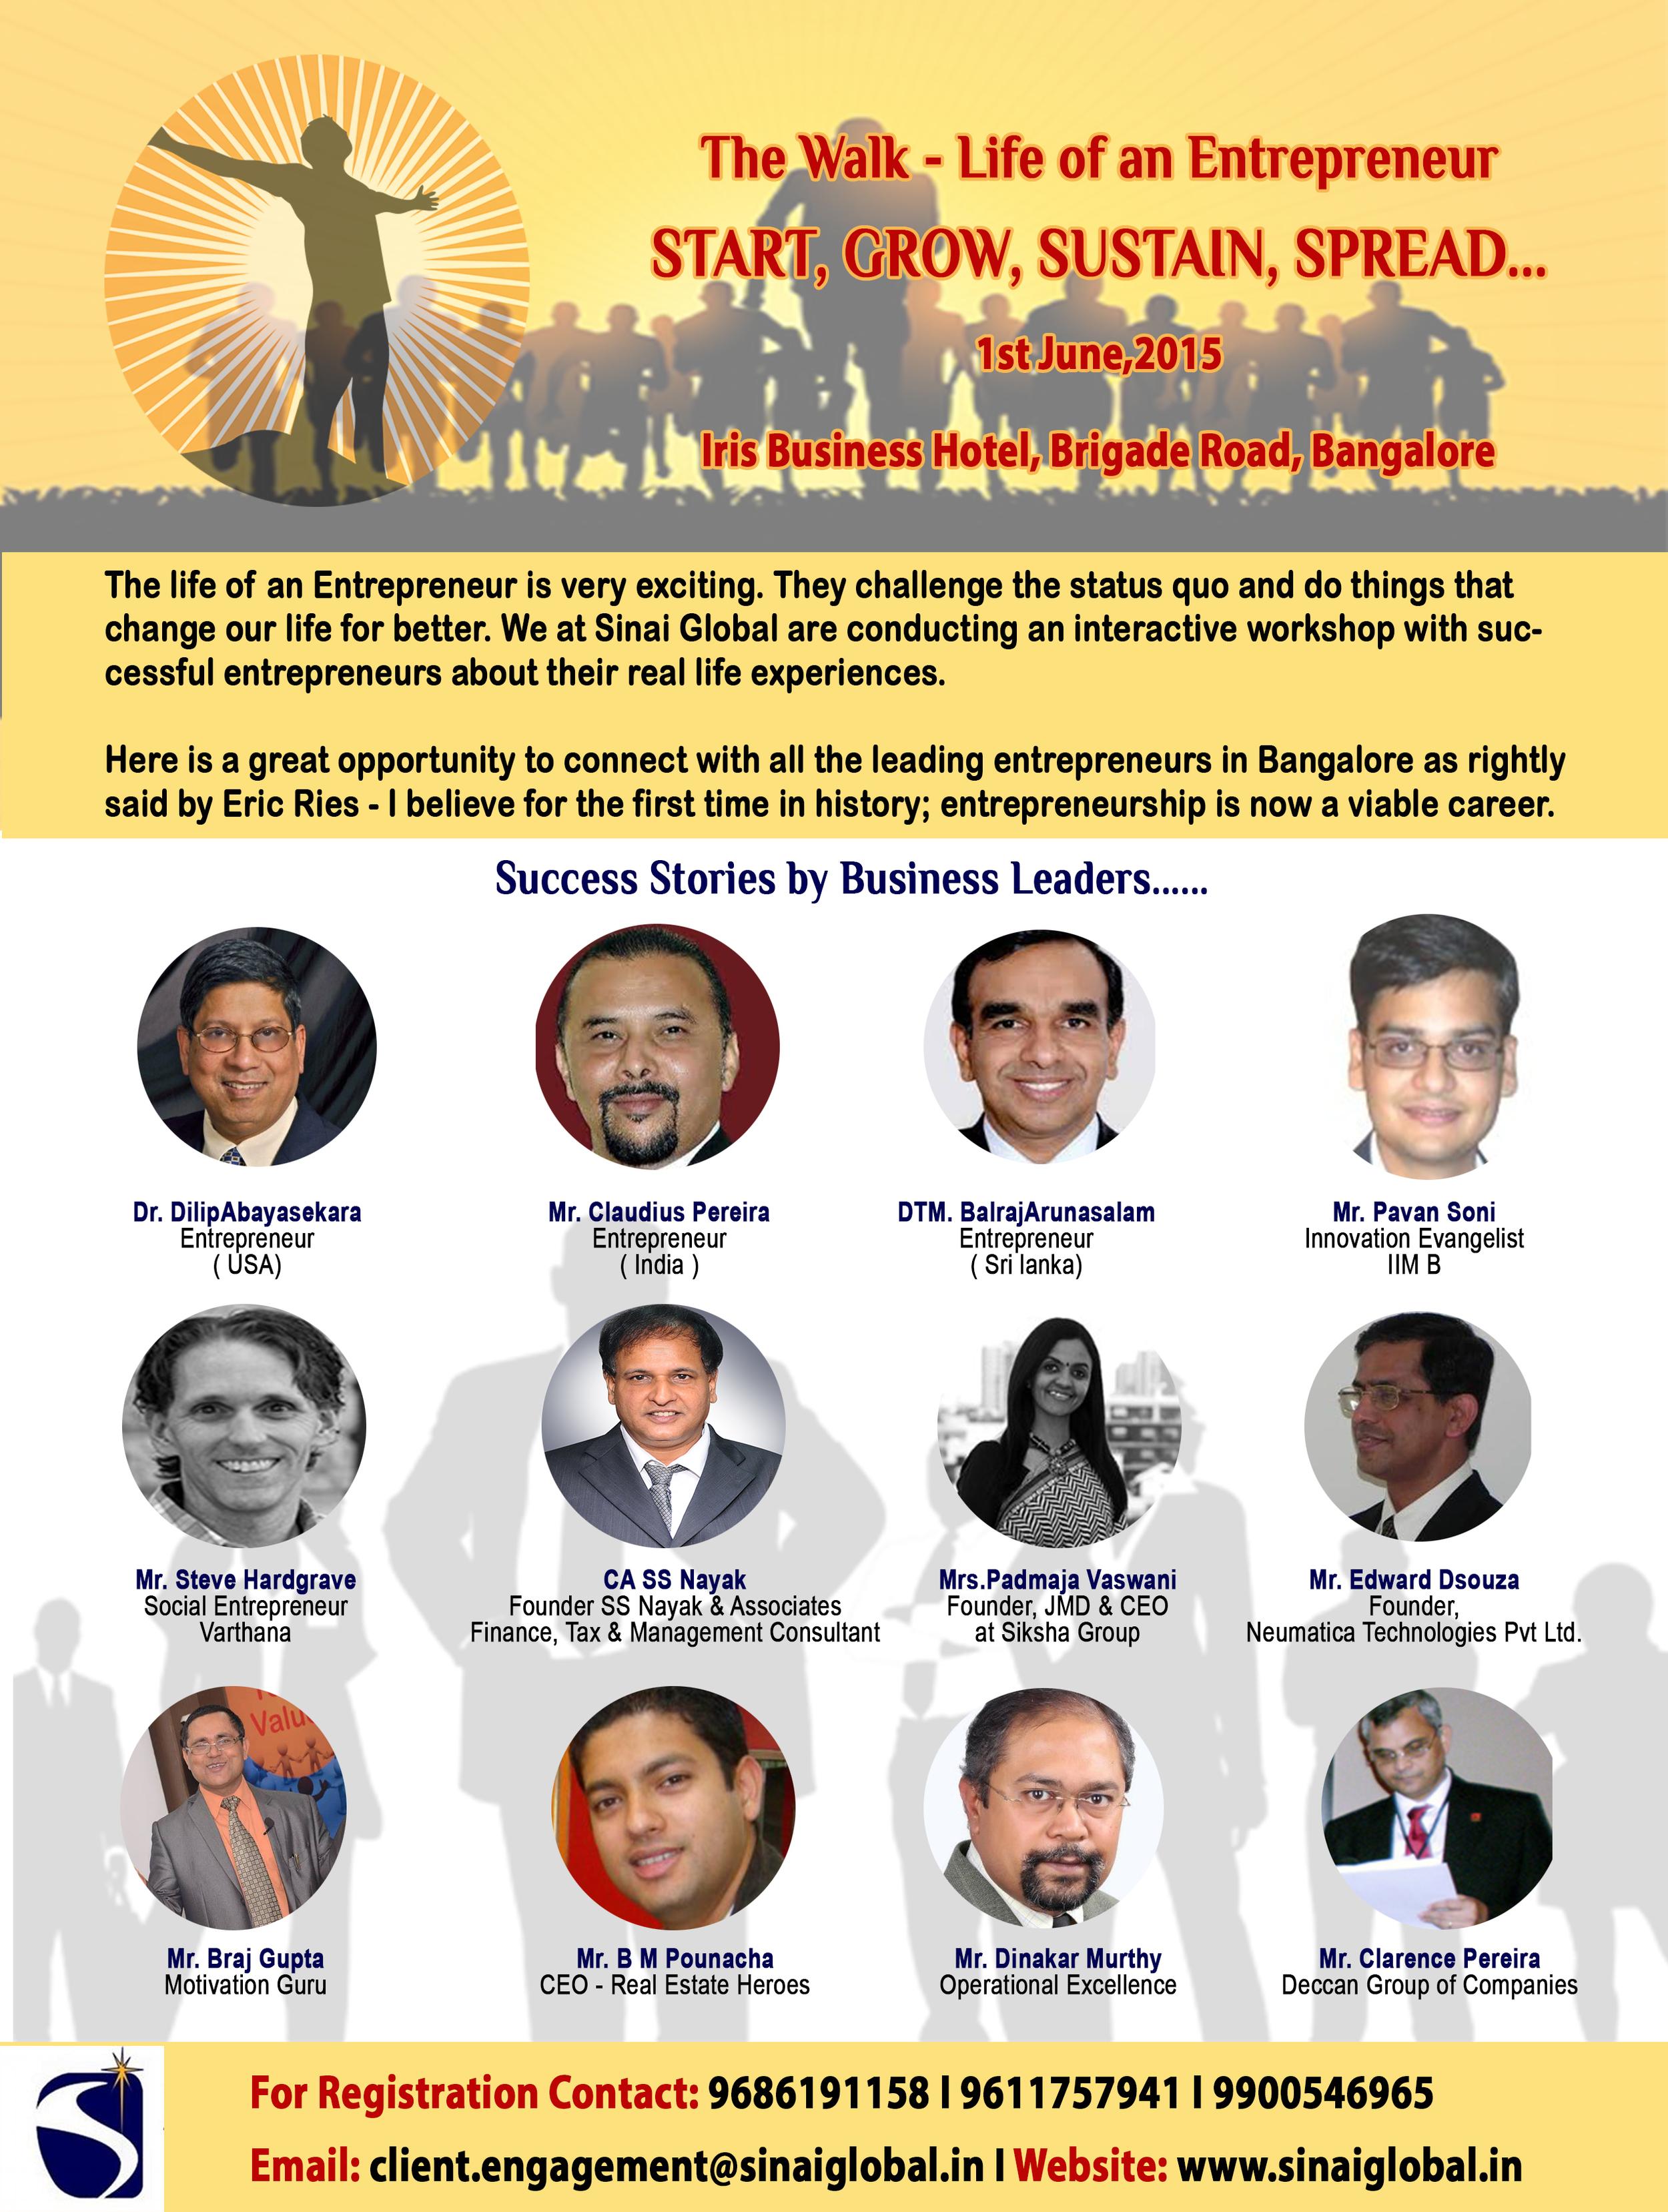 June 1, 2015 Entrepreneur Conference, Bangalore, India